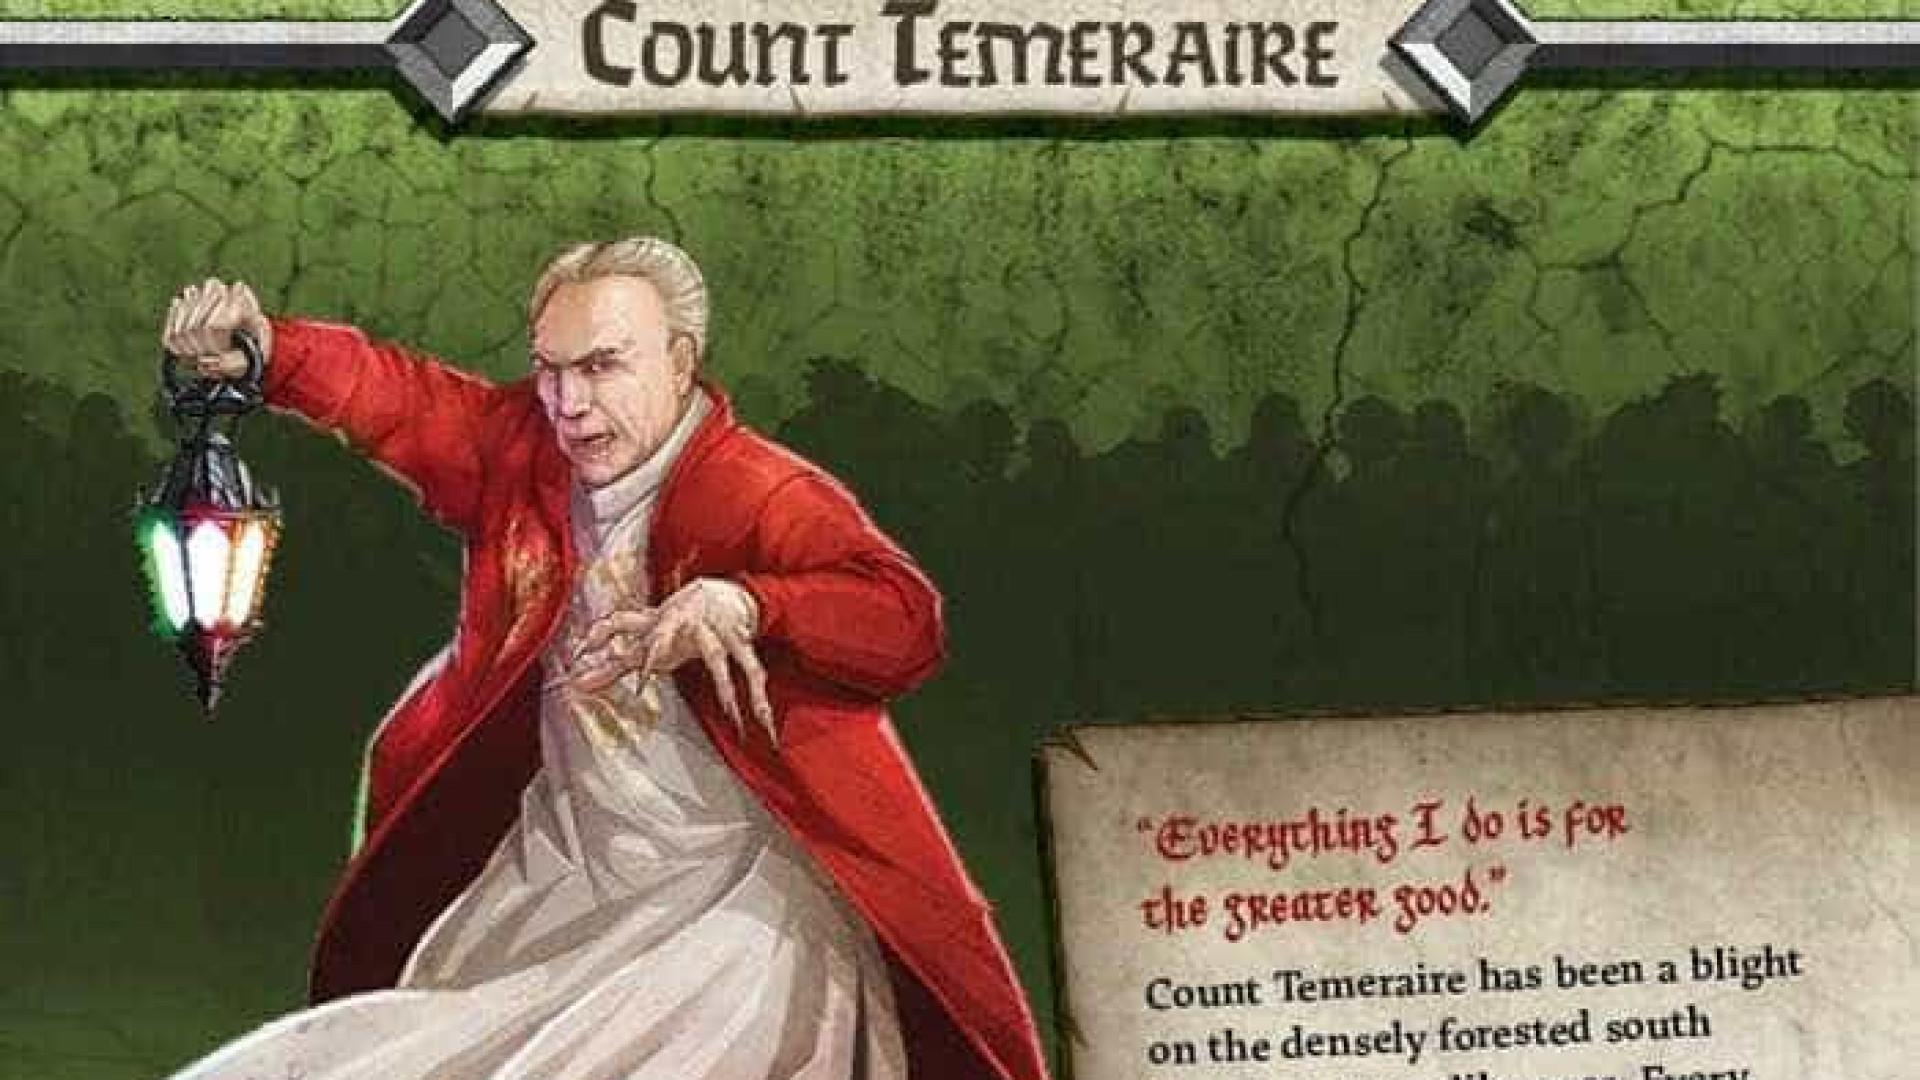 Jogo de tabuleiro faz  referência a 'Michel Temer vampiro'